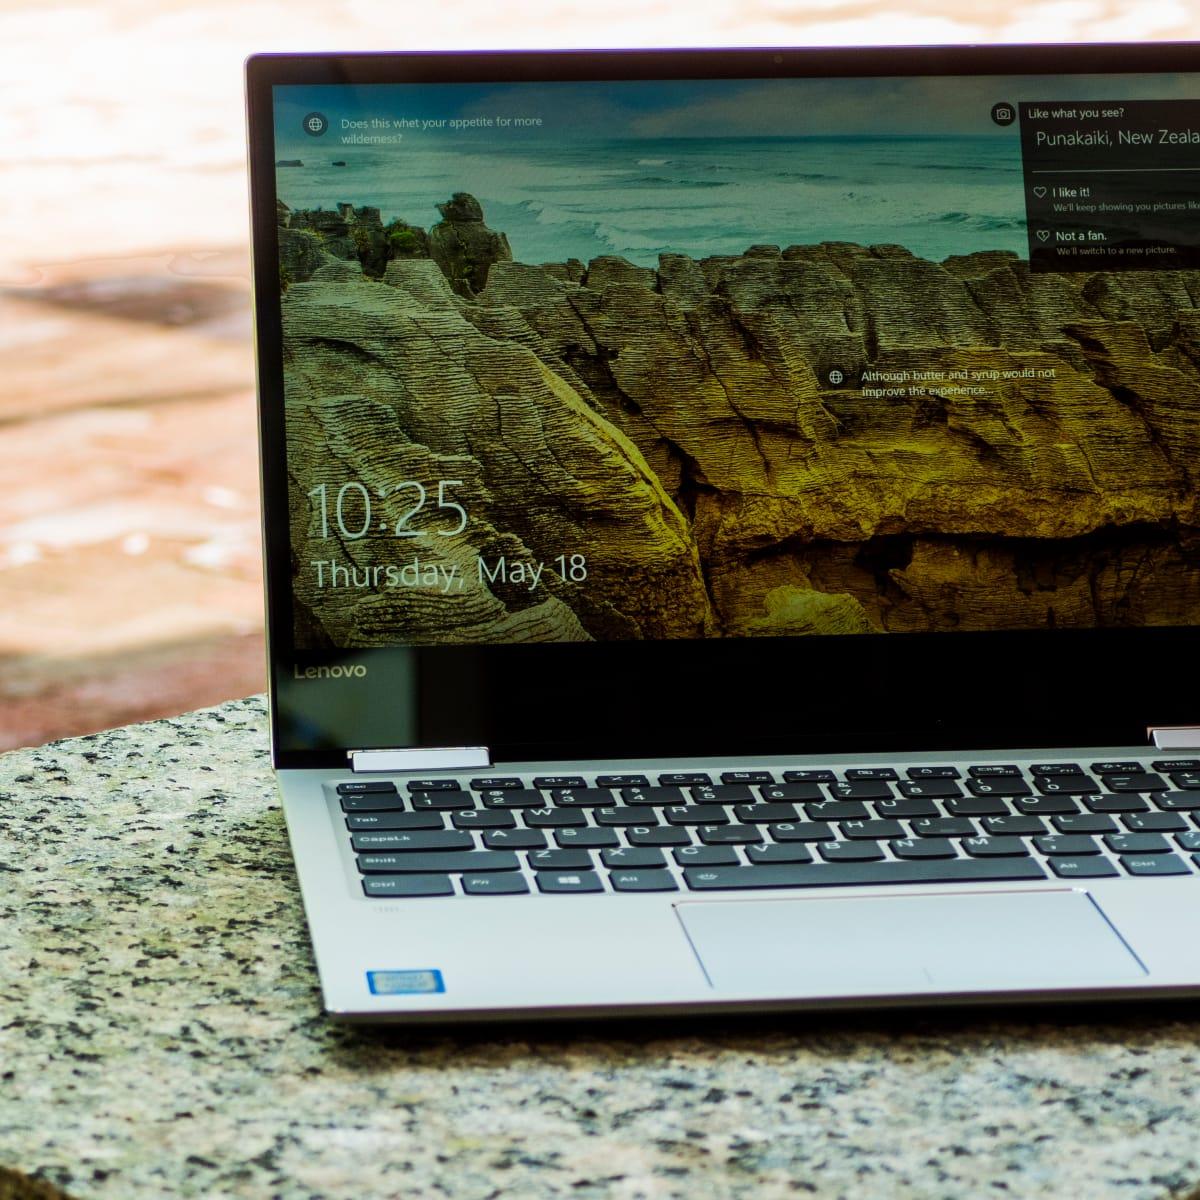 Lenovo Yoga 720 Laptop Review - Reviewed Laptops